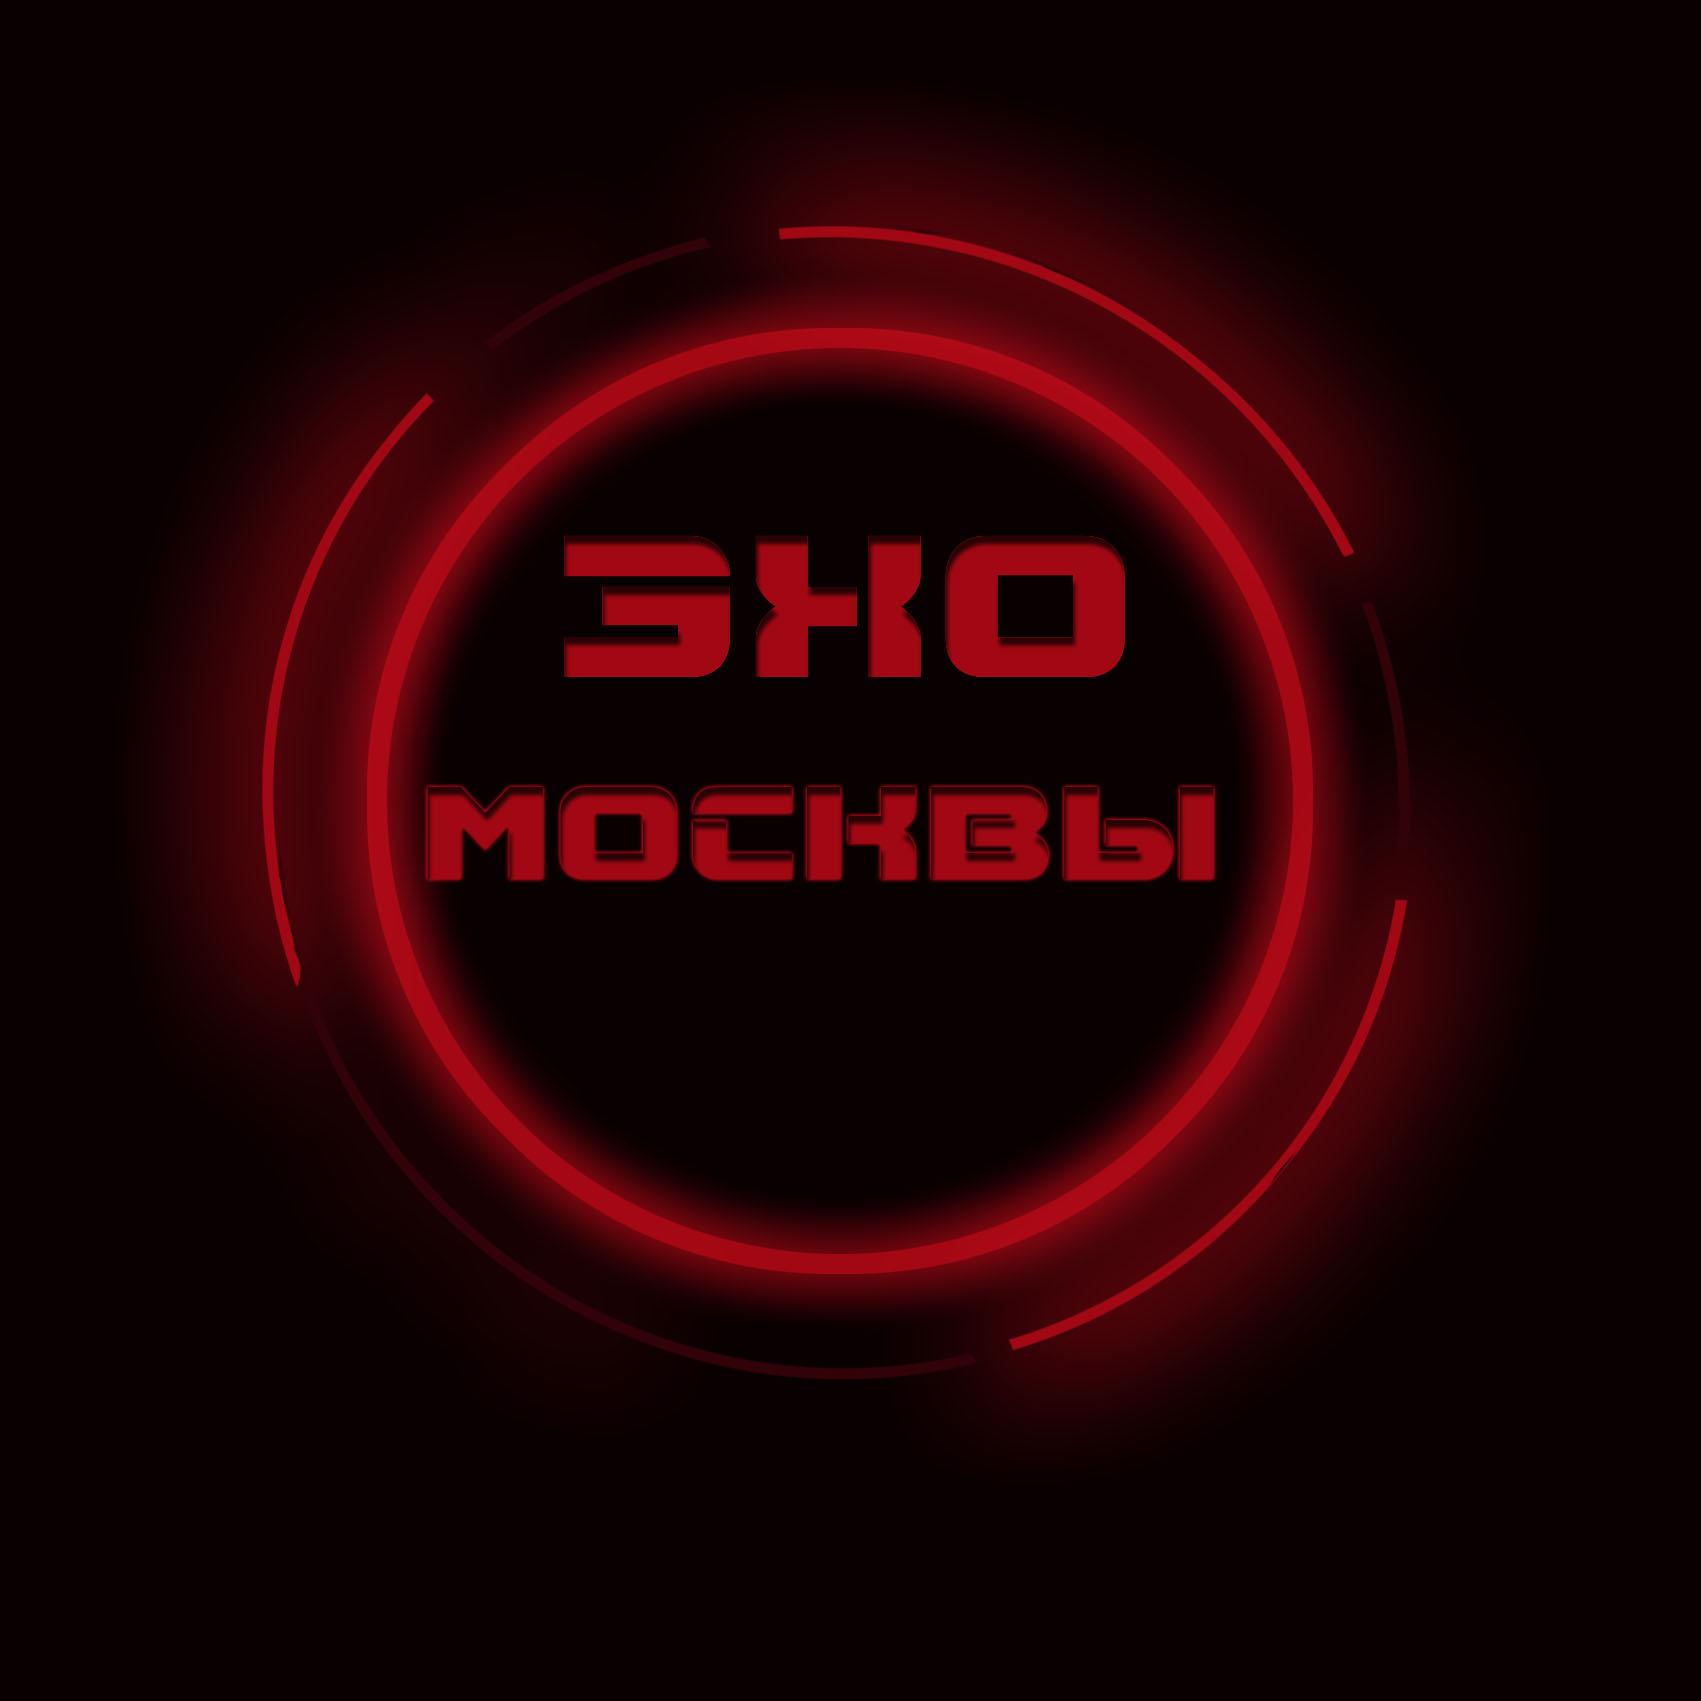 Дизайн логотипа р/с Эхо Москвы. фото f_93856262a1229c42.jpg